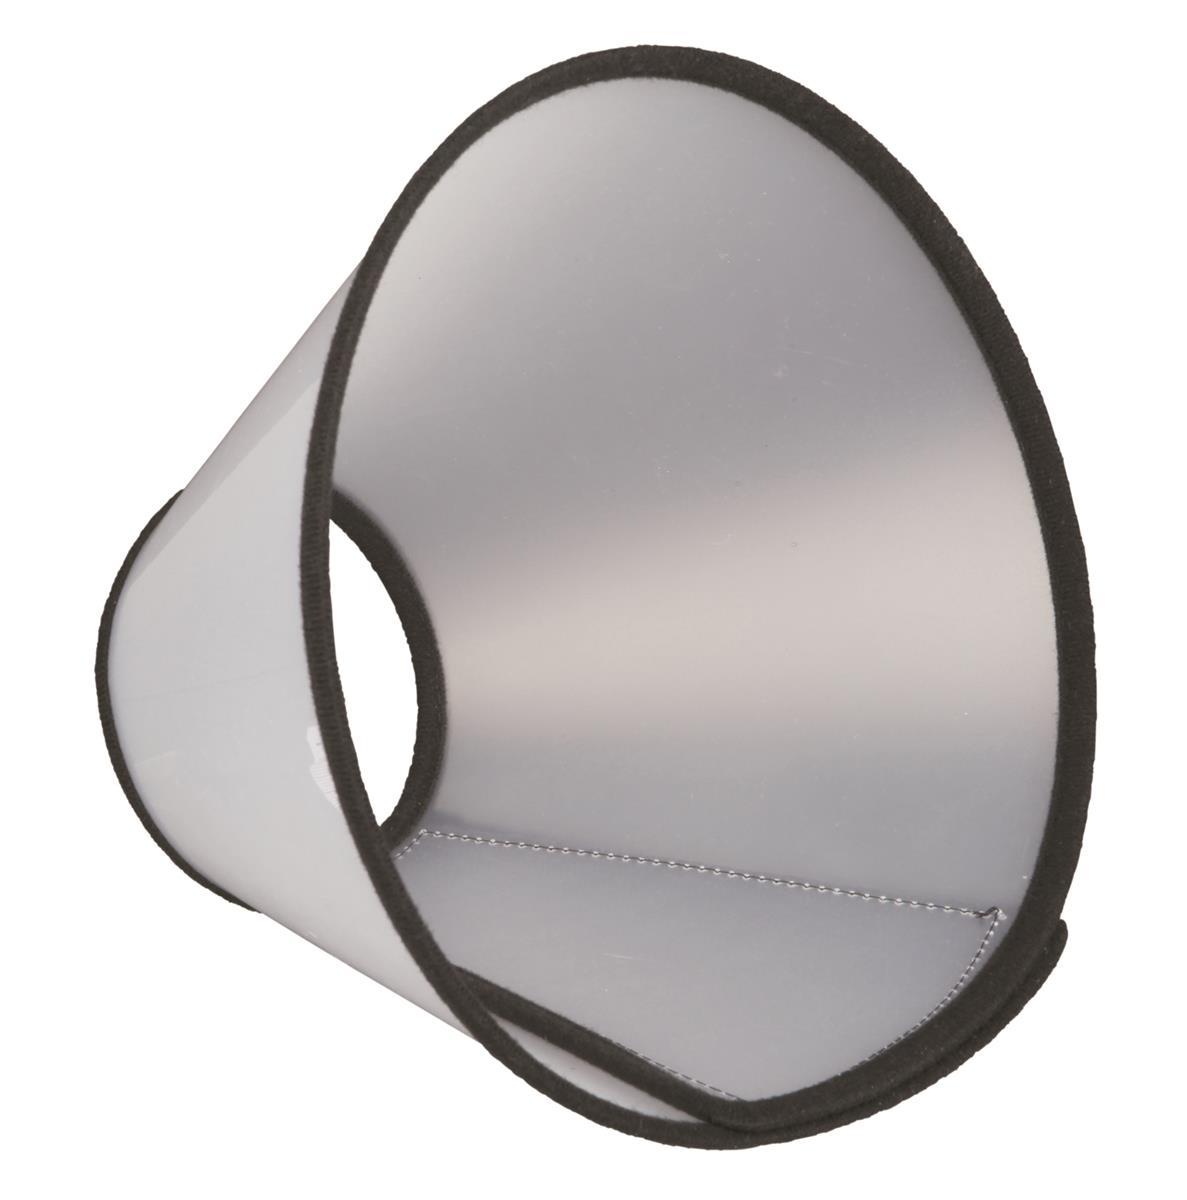 Sårskjerm M/borrelås XS-S 20-26cm